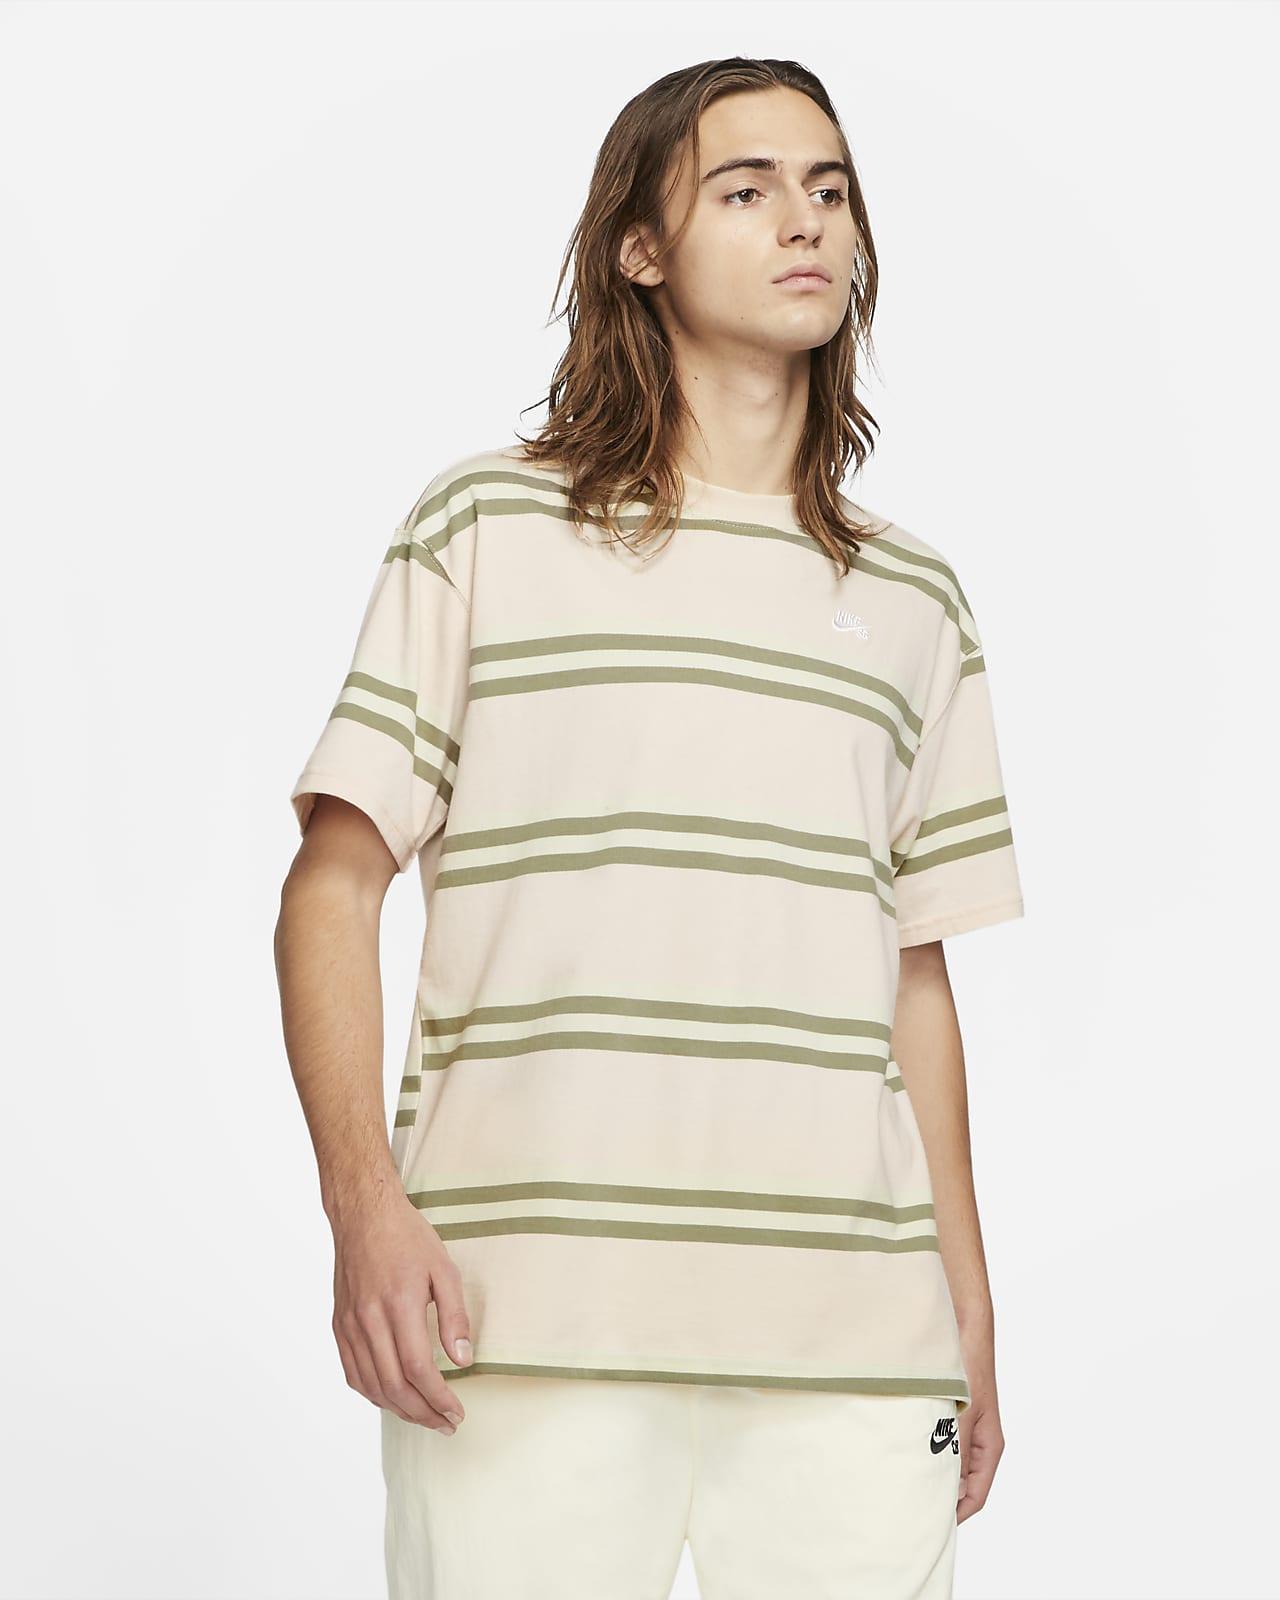 Nike SB Men's Striped Skate T-Shirt